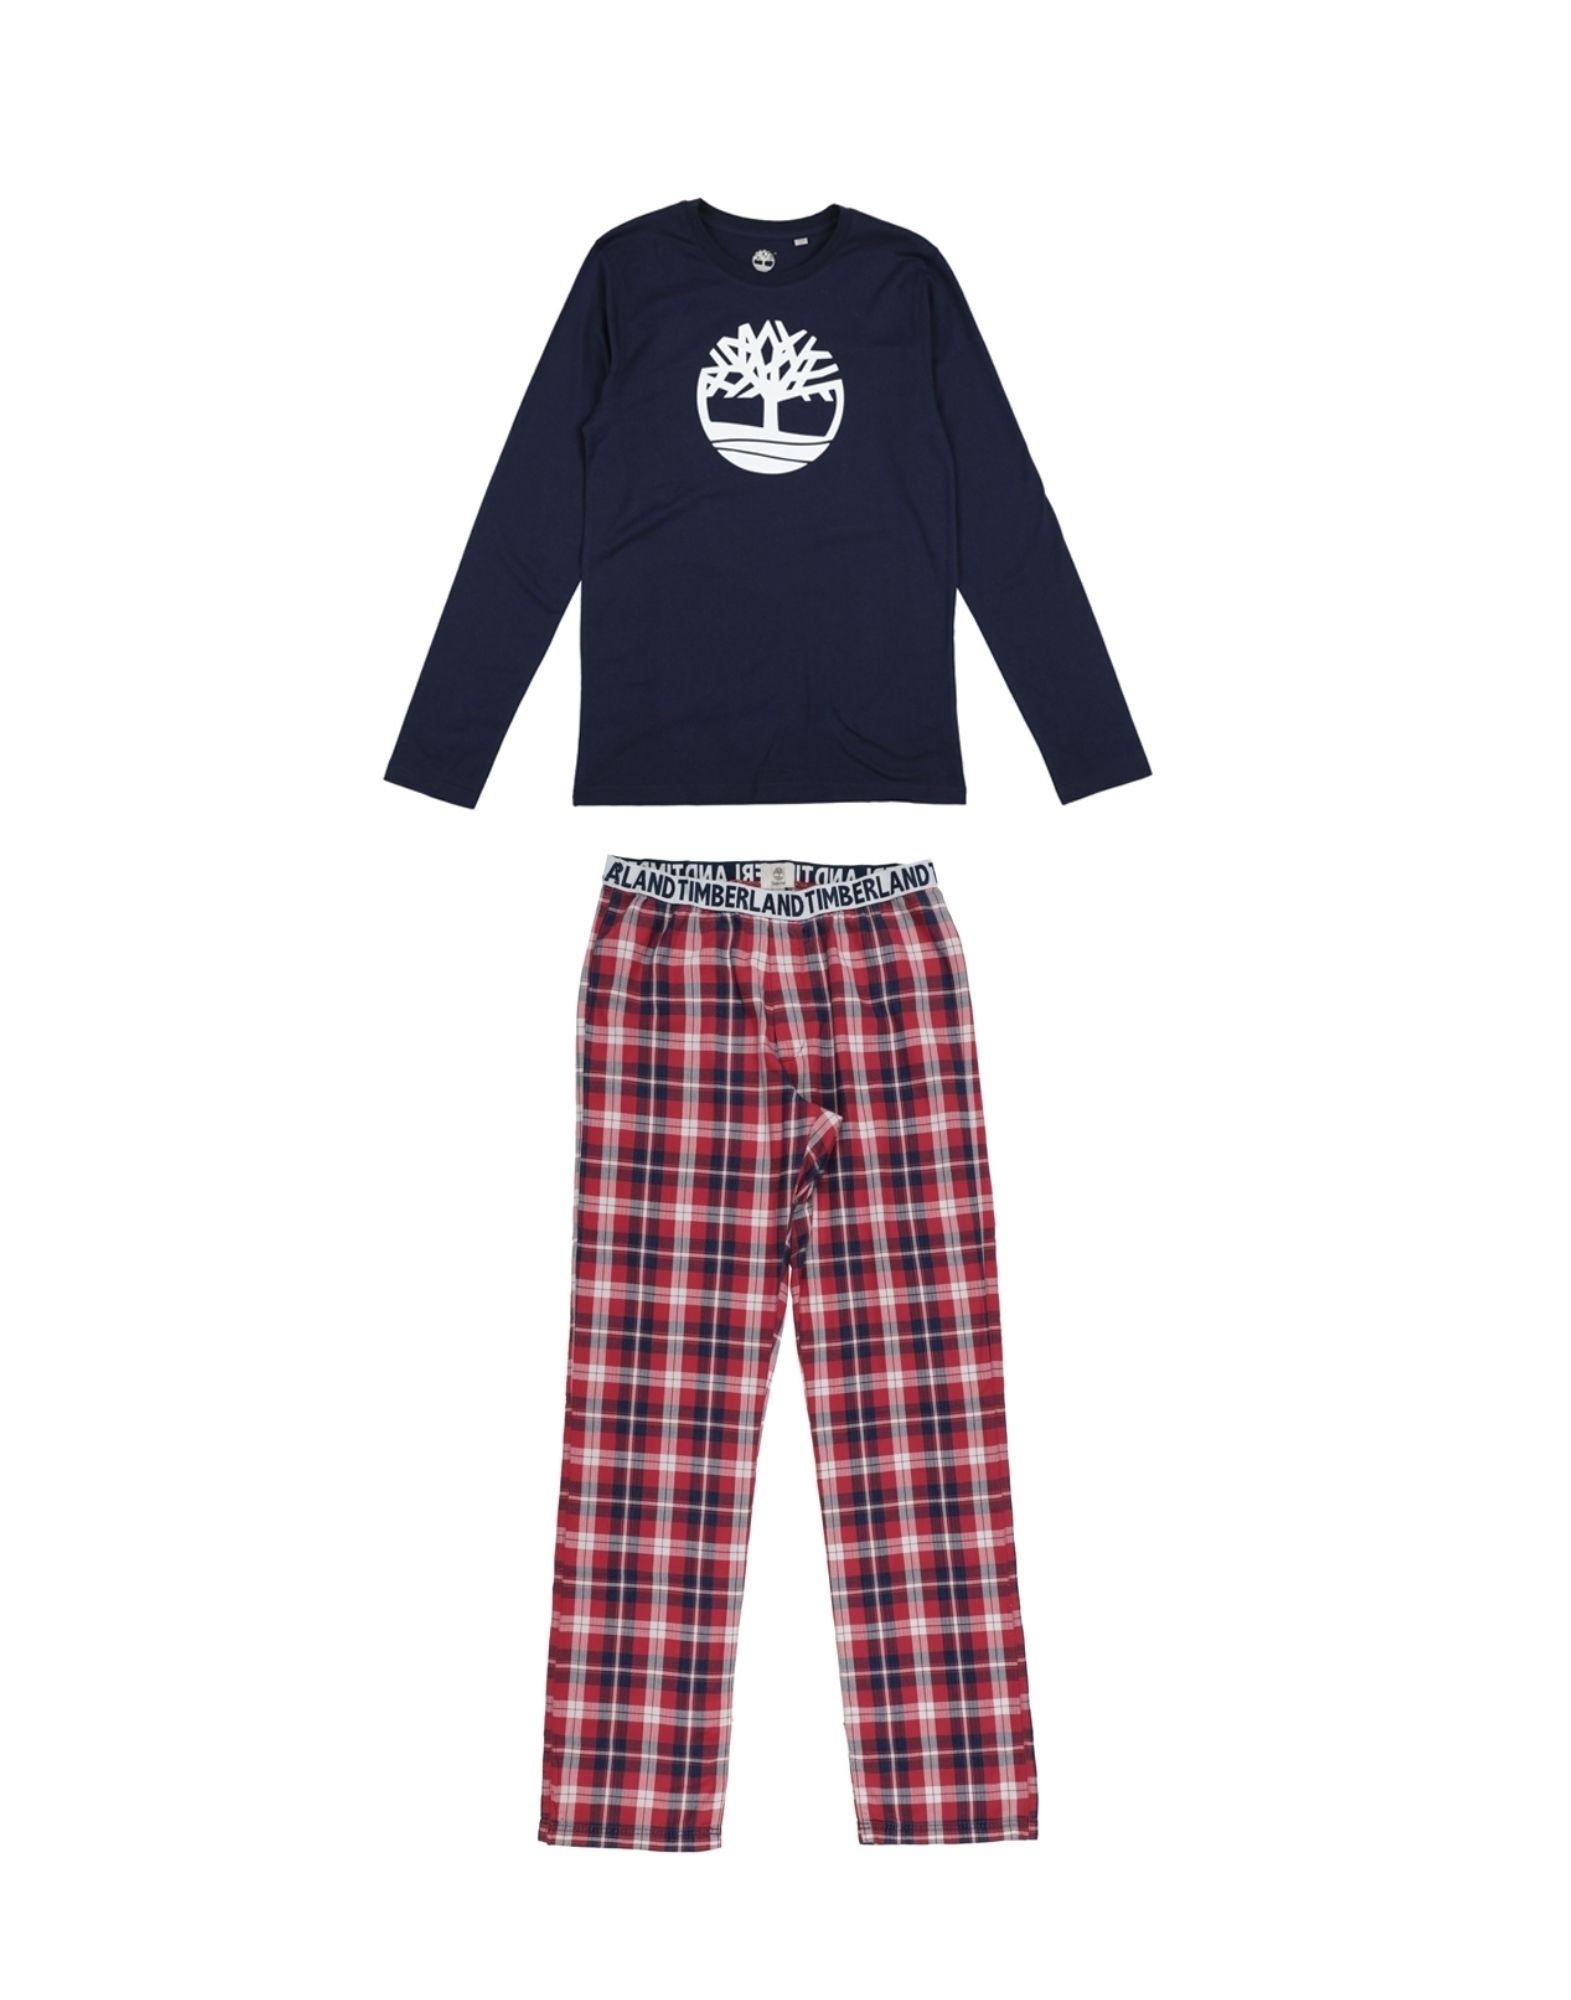 Timberland - Underwear - Sleepwear - On Yoox.com